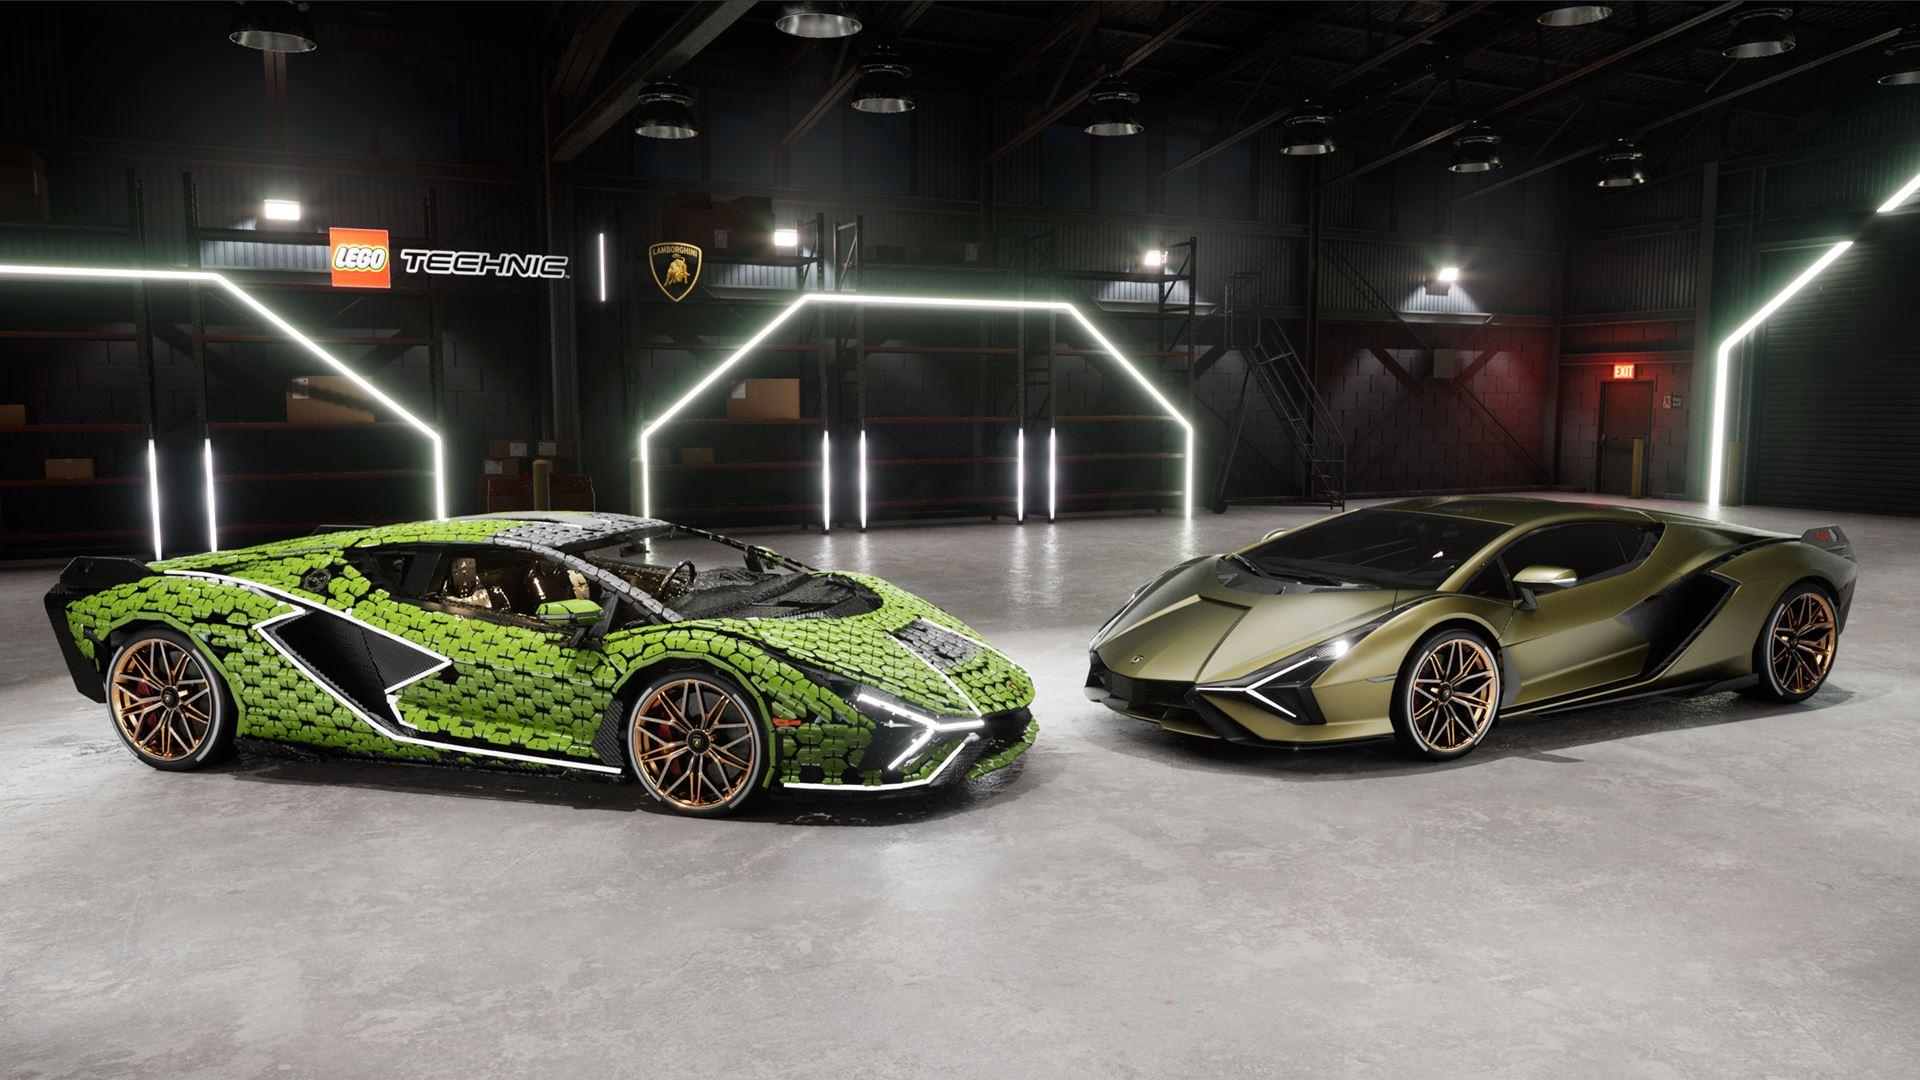 Automobili Lamborghini builds dream cars, also with LEGO® Technic™ - Life-size Lamborghini Sián FKP 37 created from over 400,000 LEGO® elements - Image 3